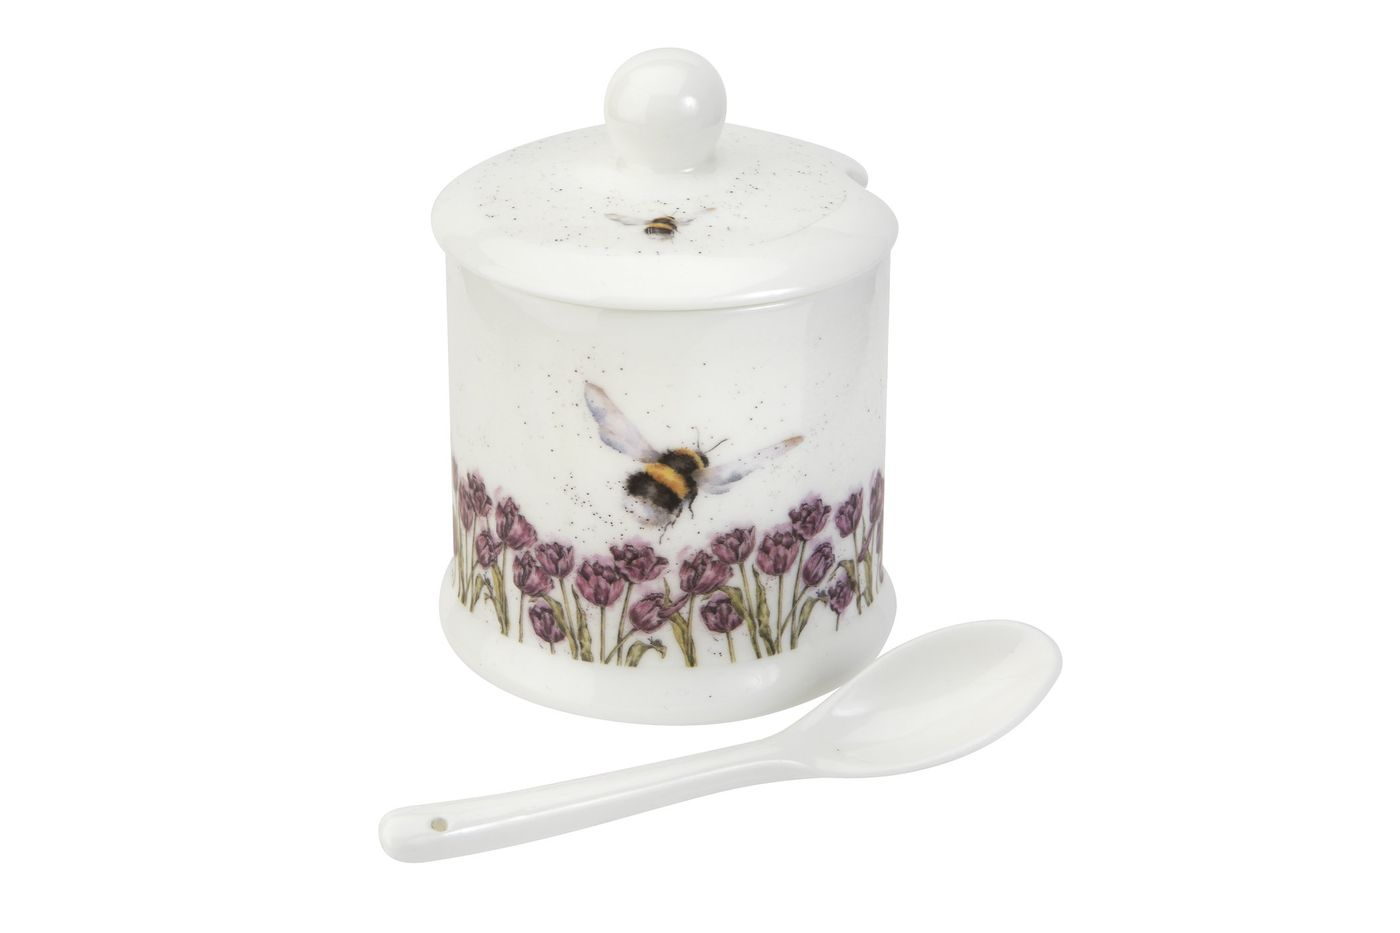 Royal Worcester Wrendale Designs Jam Pot + Lid Bumble Bee 0.11l thumb 1